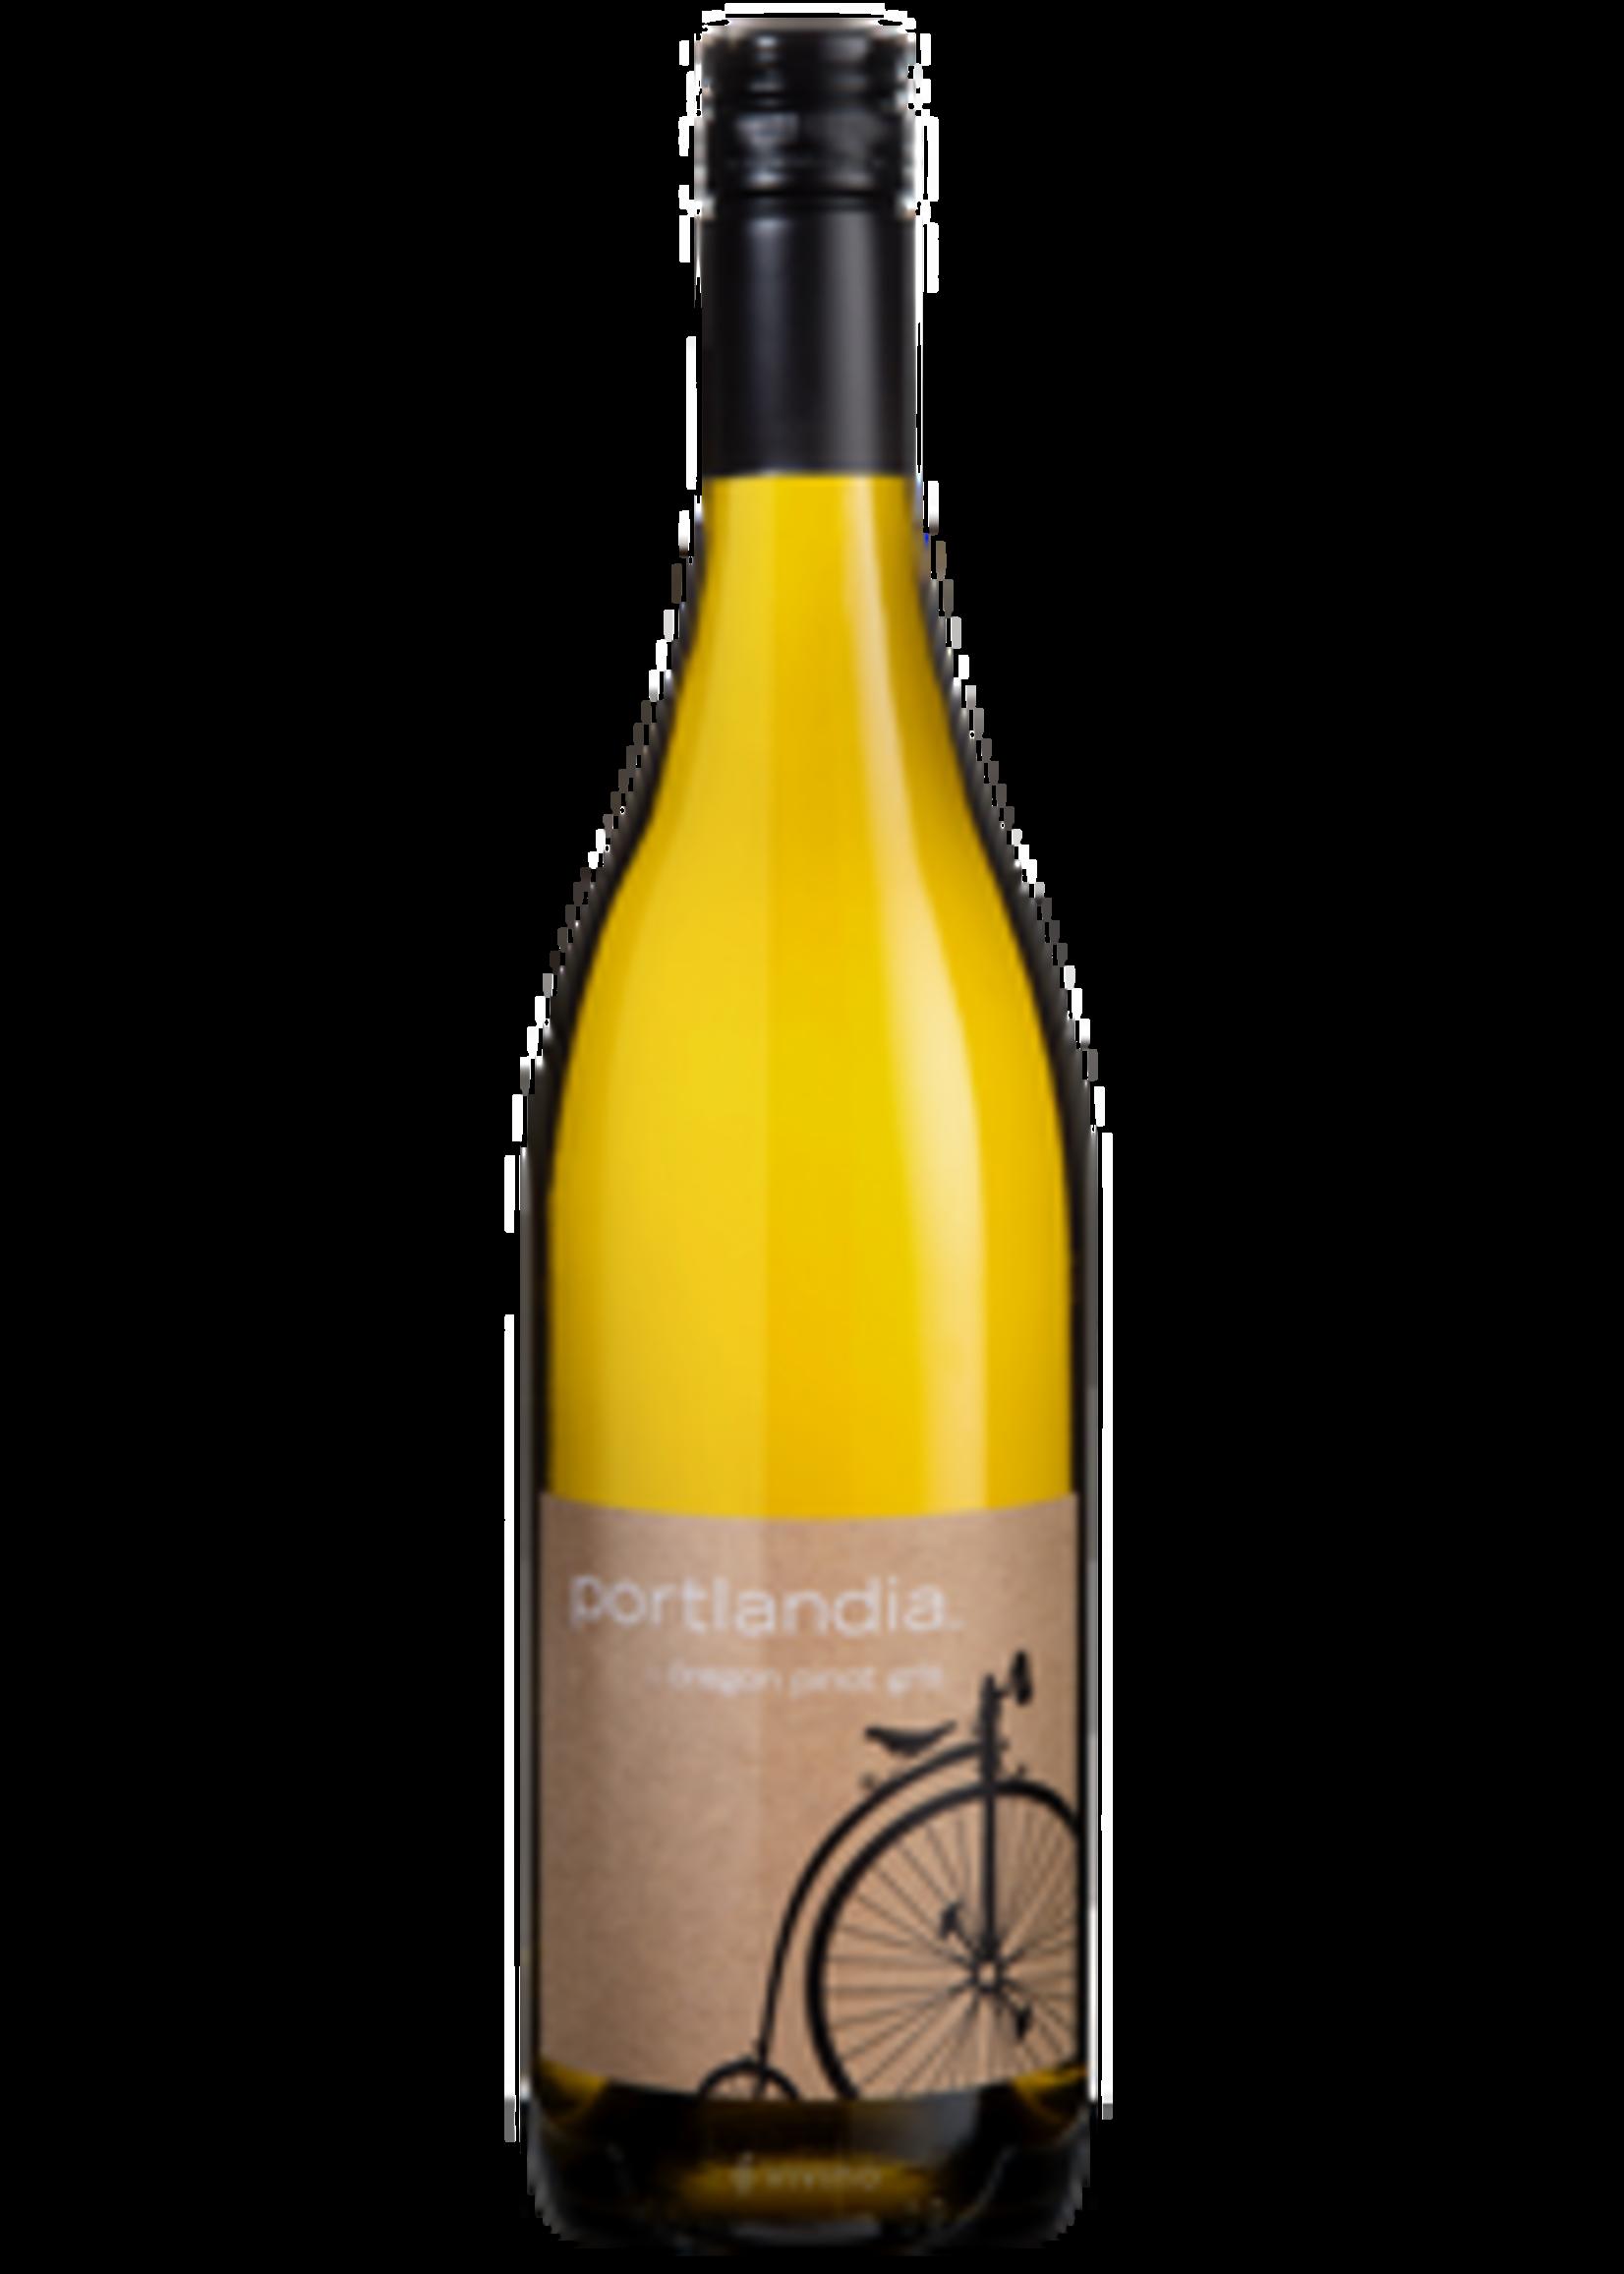 Portlandia Pinot Gris